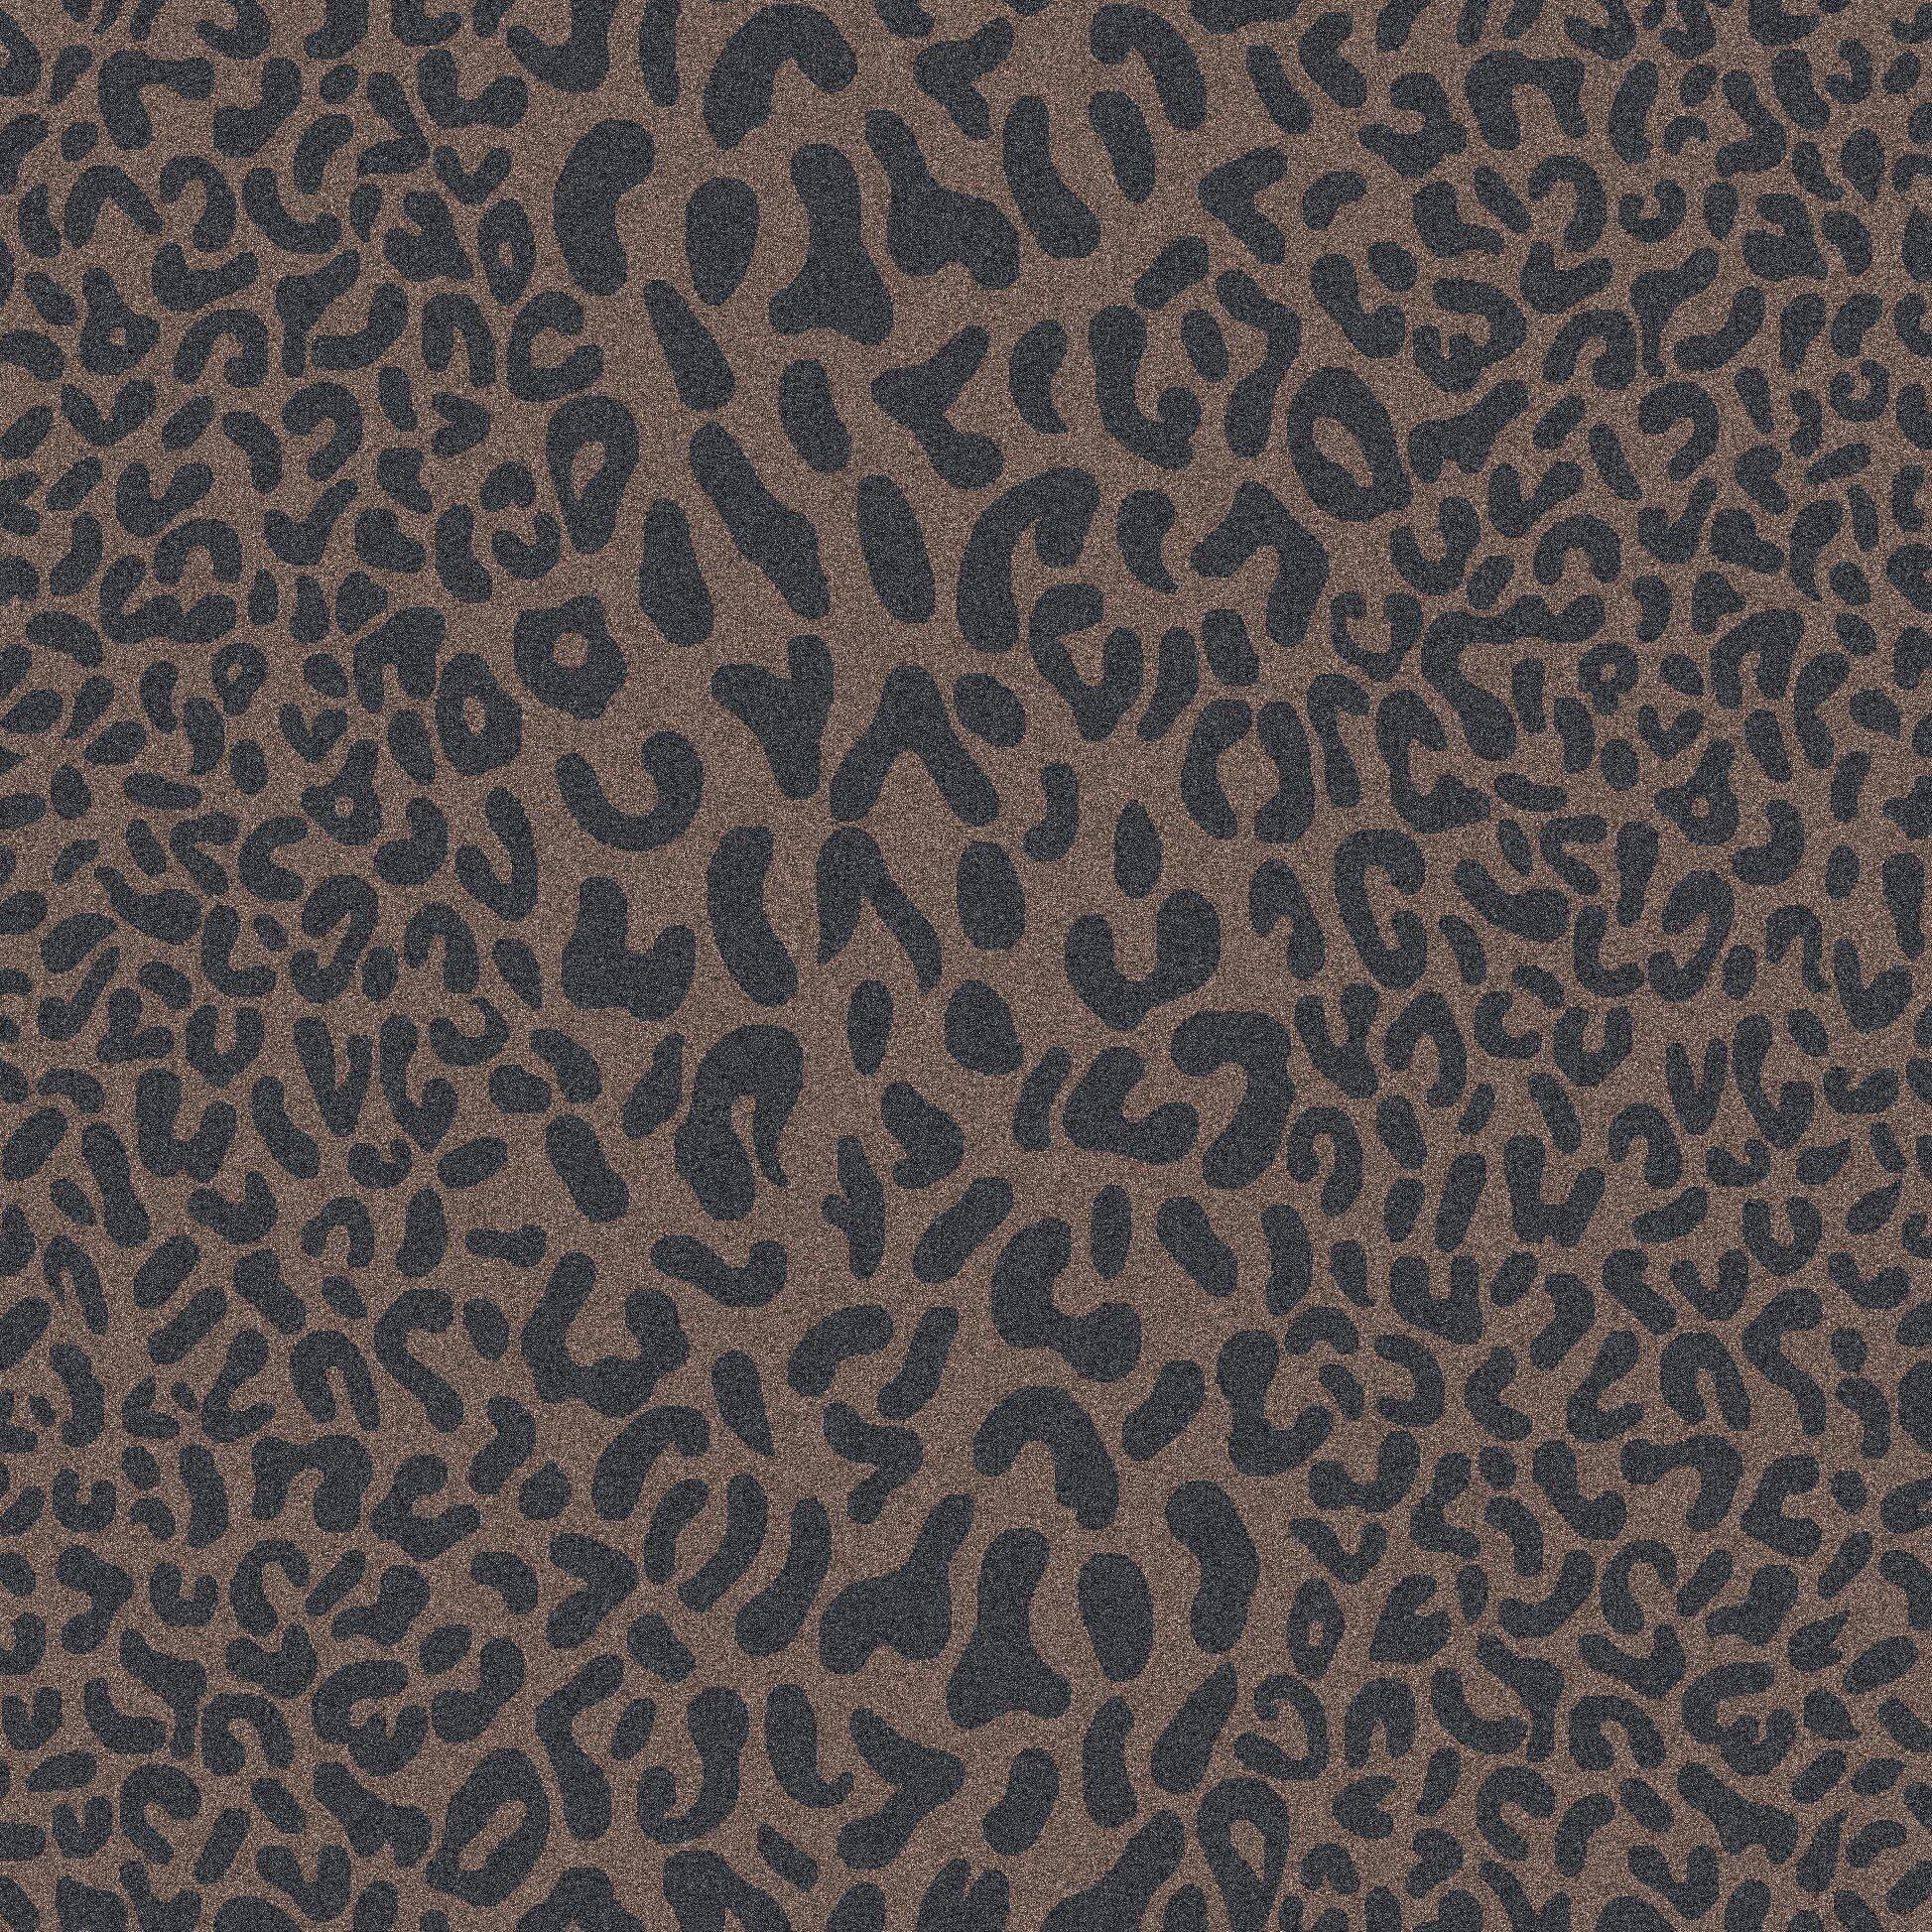 Animal Print Rug Grey: Wade Logan Macias Handmade Grey Animal Print Area Rug